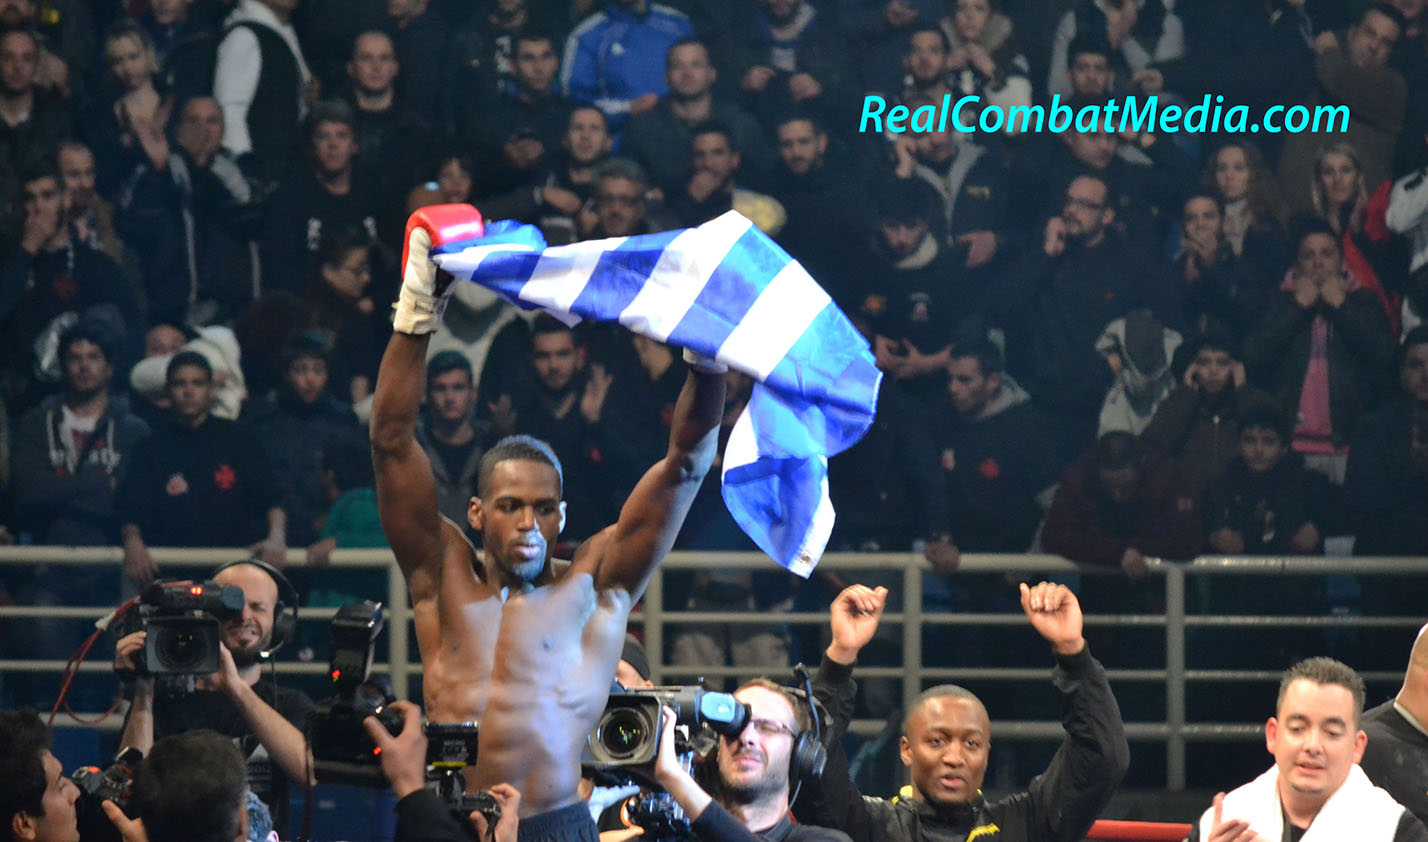 RCMGreece Boxing/MMA: Murthel Groenhart  K-1 World Max Finals Champion!